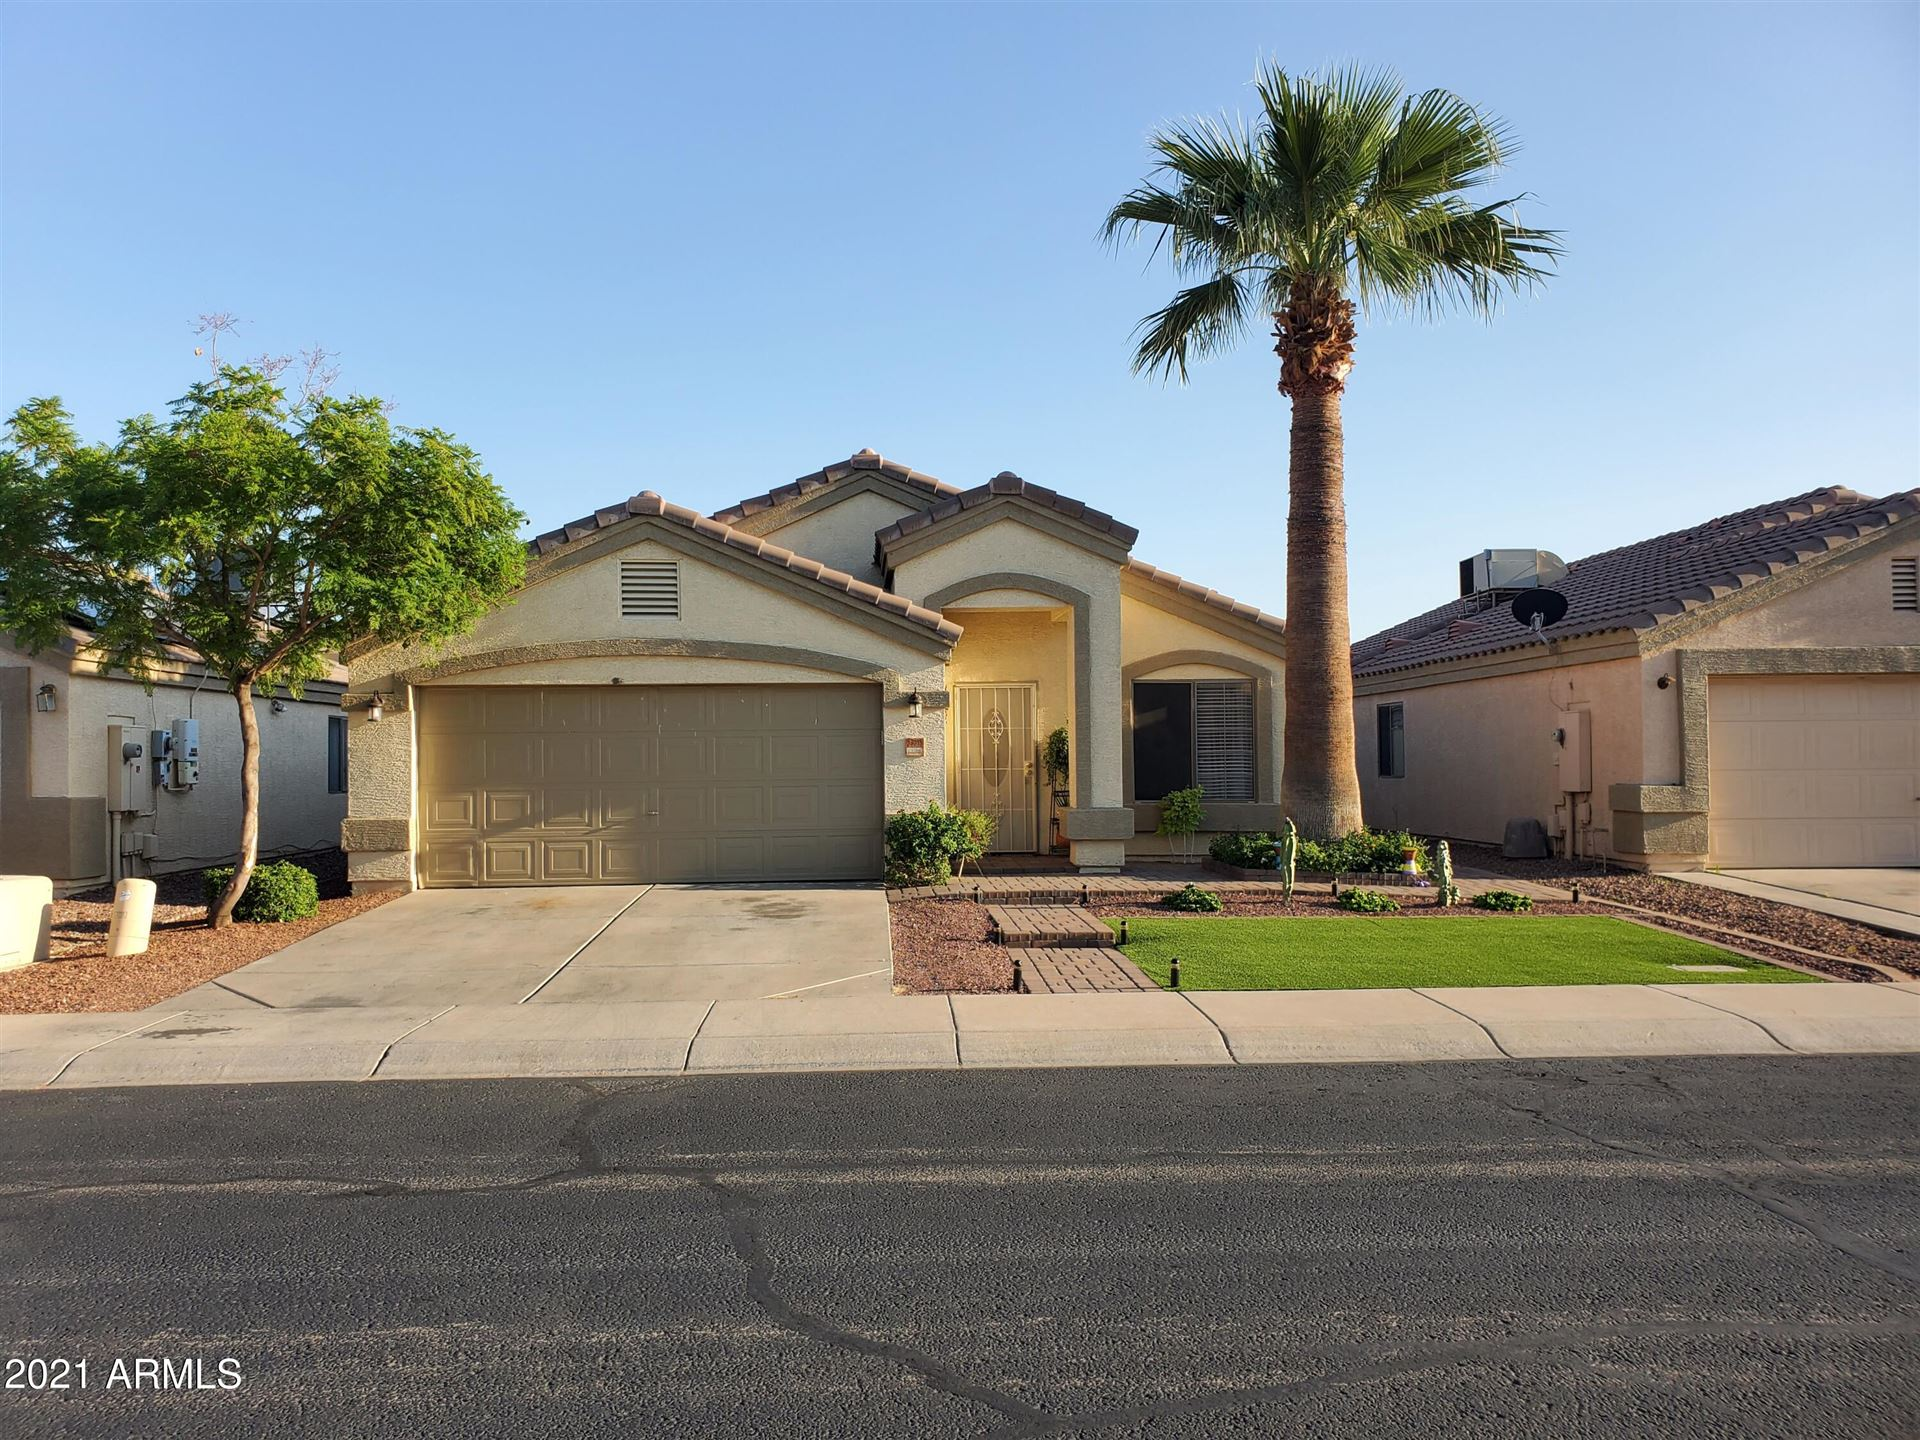 Photo of 13033 W REDFIELD Road, El Mirage, AZ 85335 (MLS # 6292333)